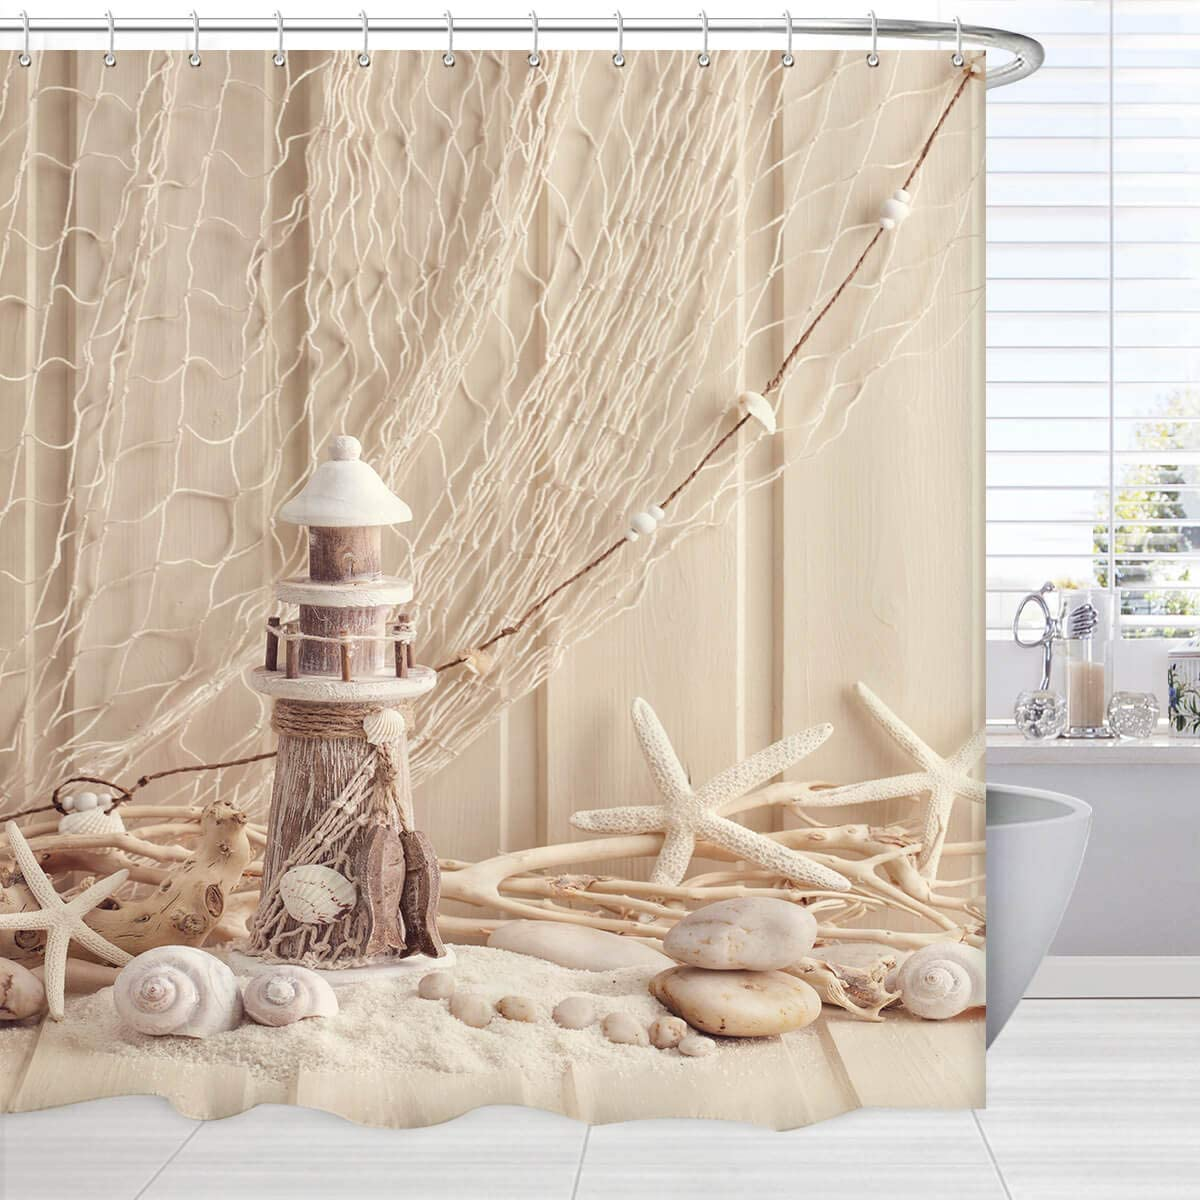 Amazon Com Broshan Beige Fabric Shower Curtain Modern Fishing Net Seashell Marine Beach Theme Bath Curtain Nautical Fabric Bathroom Accessories Set With Hooks Kitchen Dining